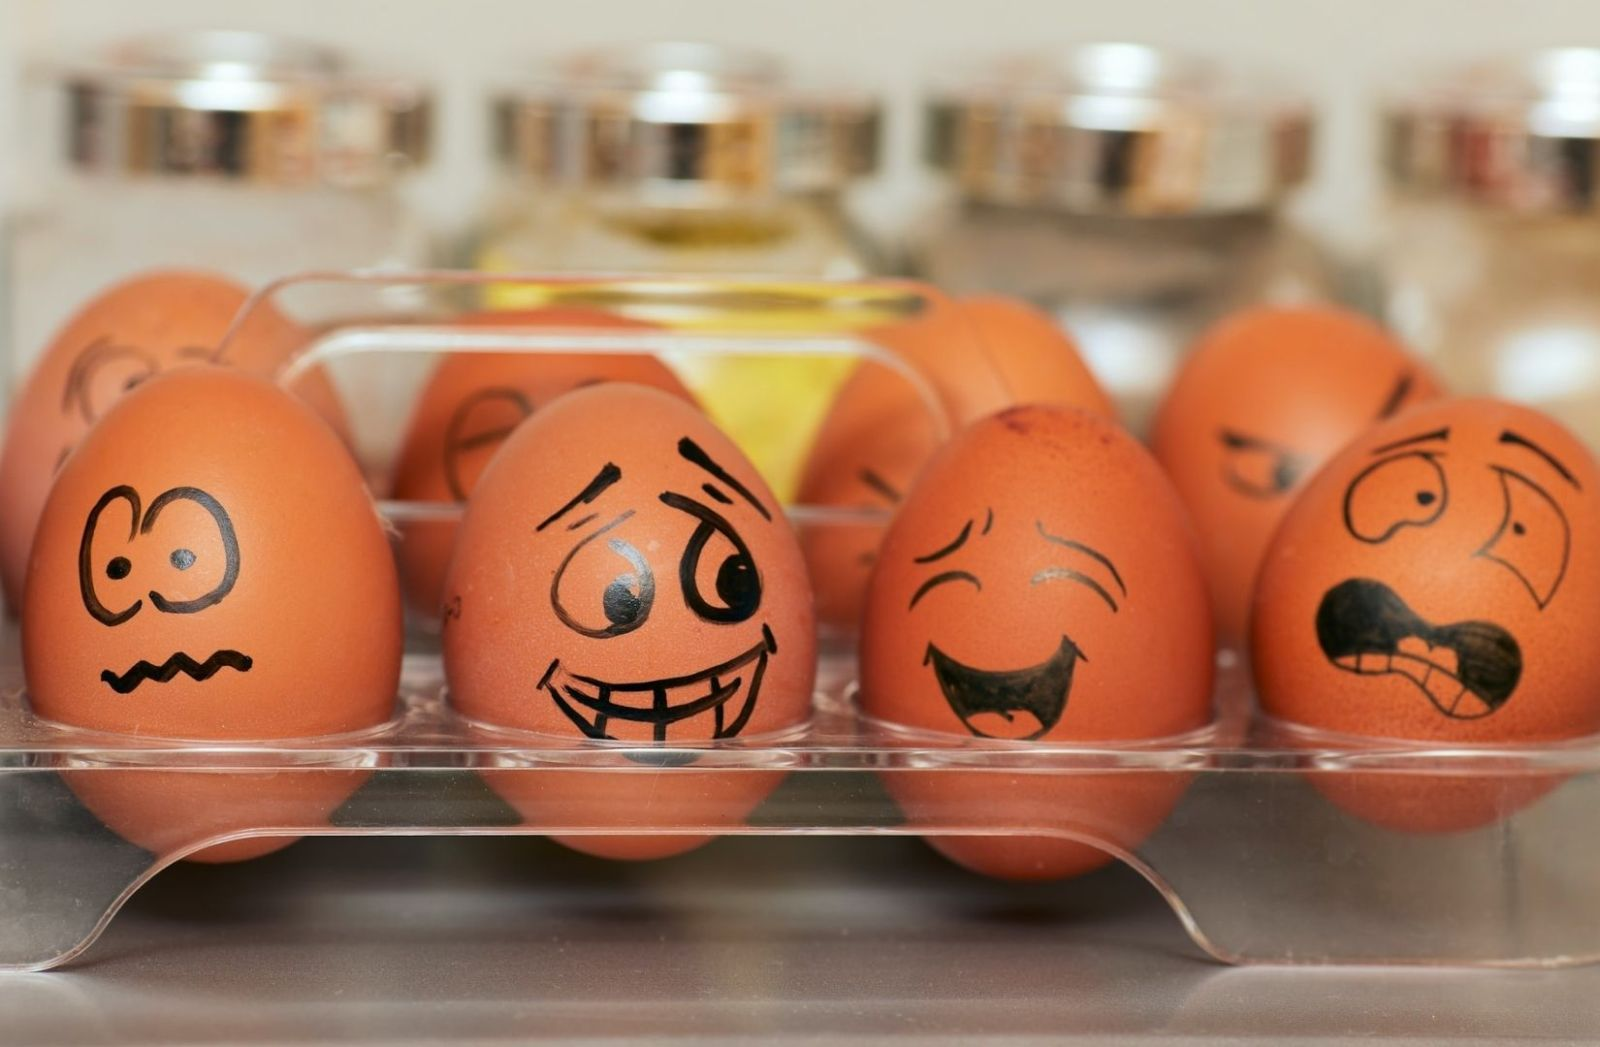 Bemalte Eier im Kühlschrank. (Foto: Tengyart, Unsplash.com)